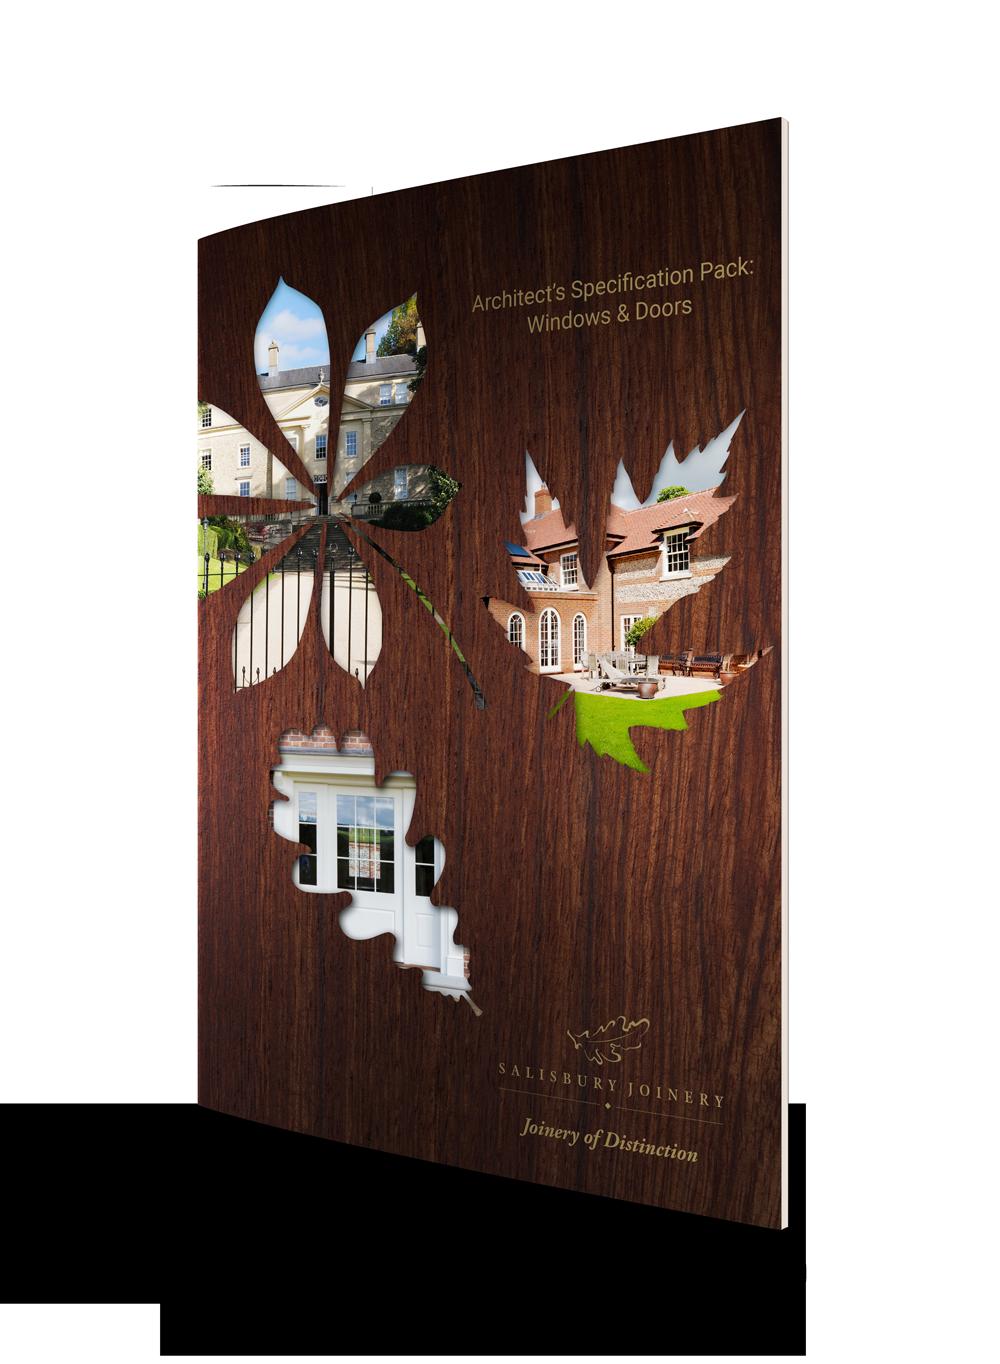 sj-architectspack-windows-doors-cta-cover.png